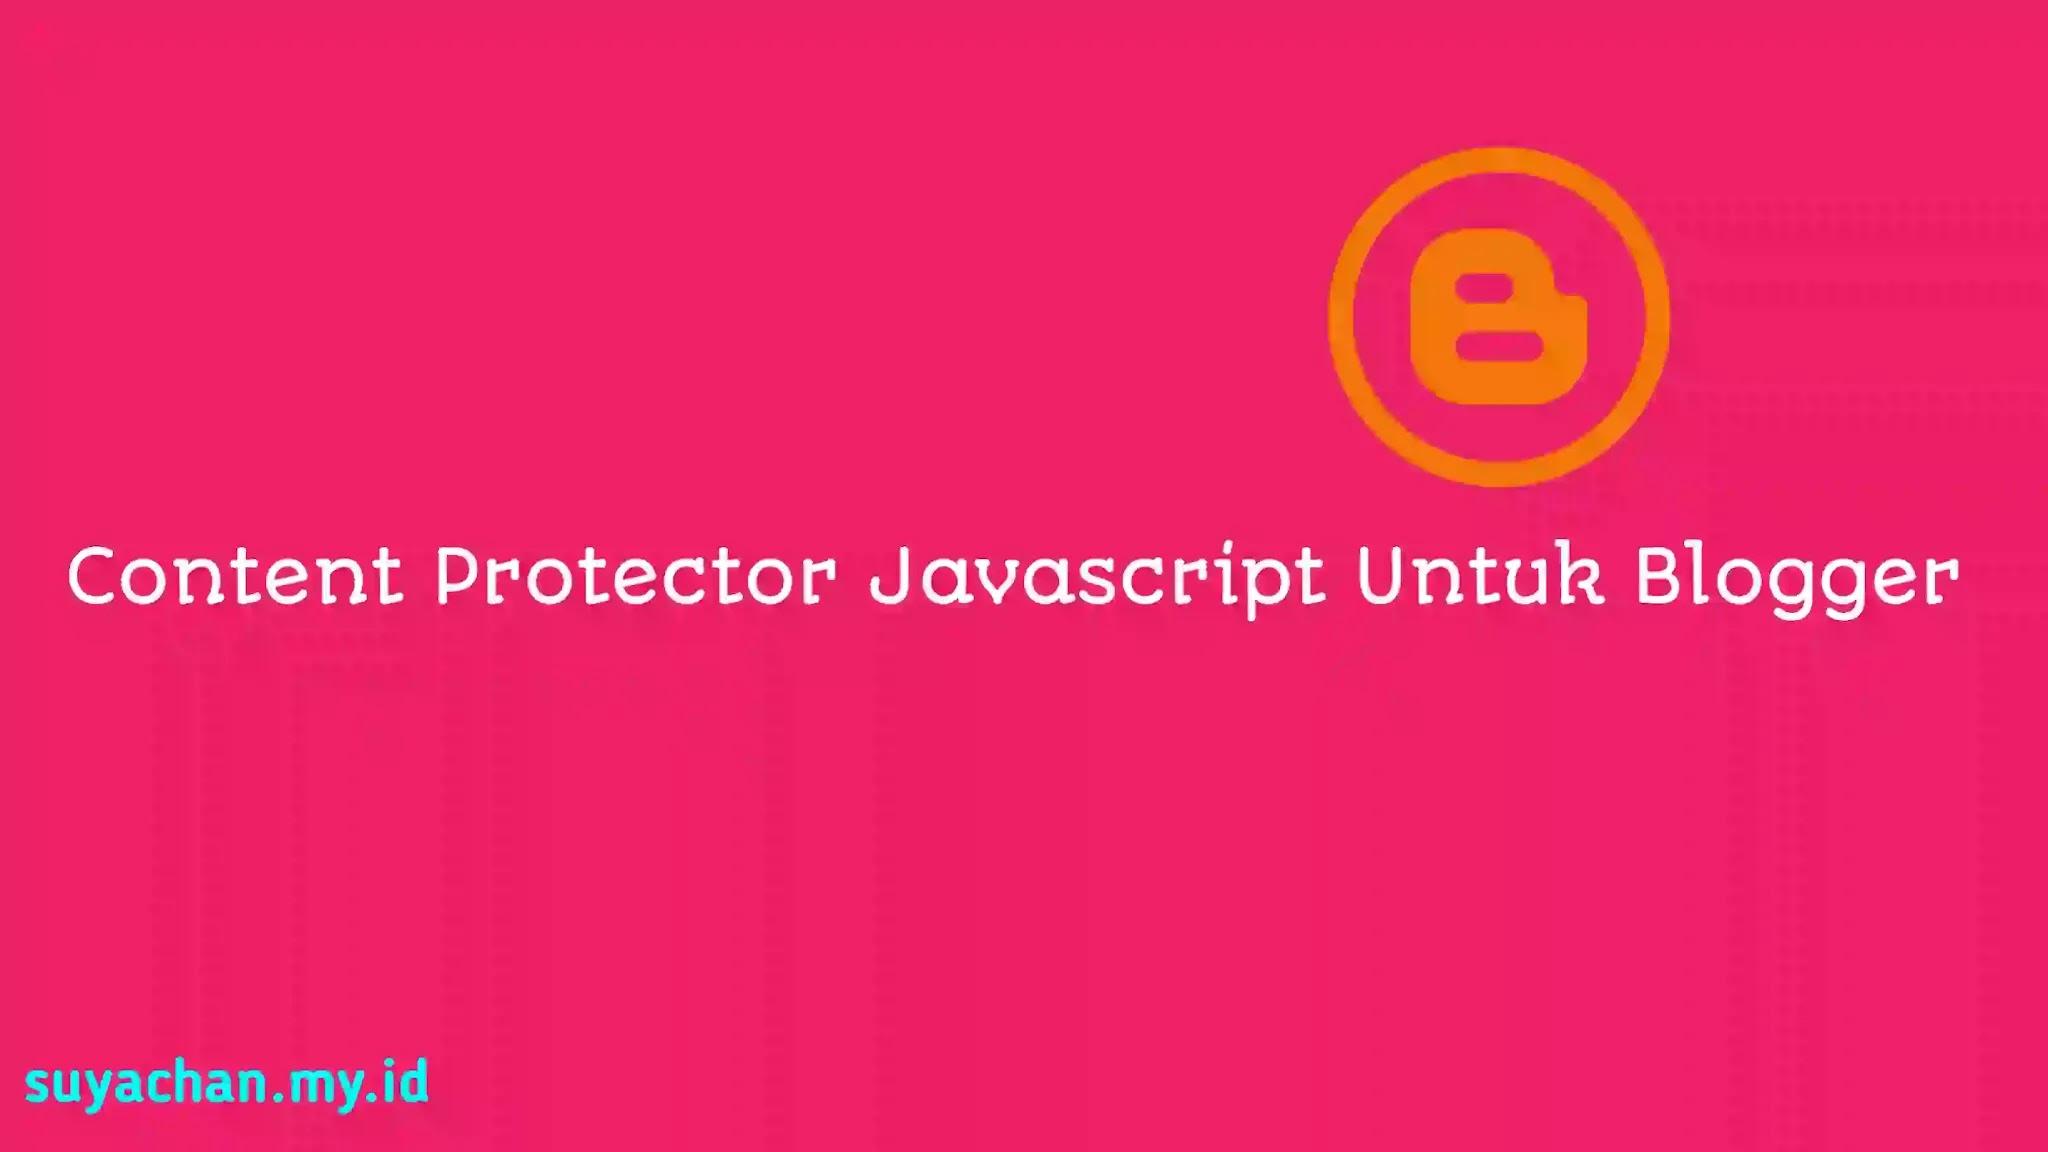 Content Protector Javascript Untuk Blogger